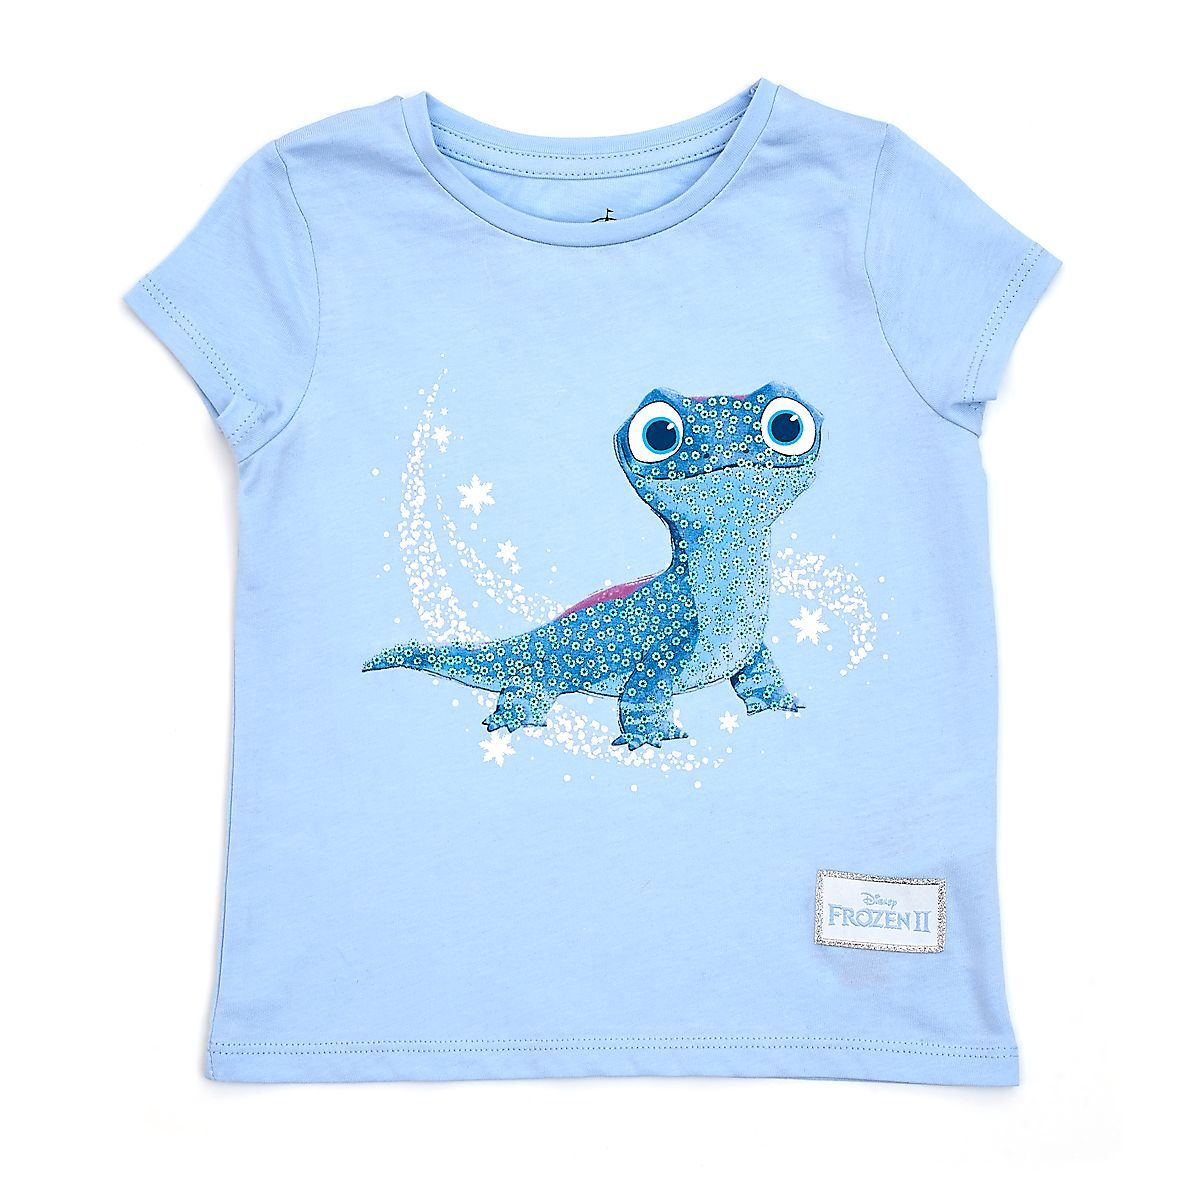 Disney Store Bruni TShirt For Kids, Frozen 2 in 2020